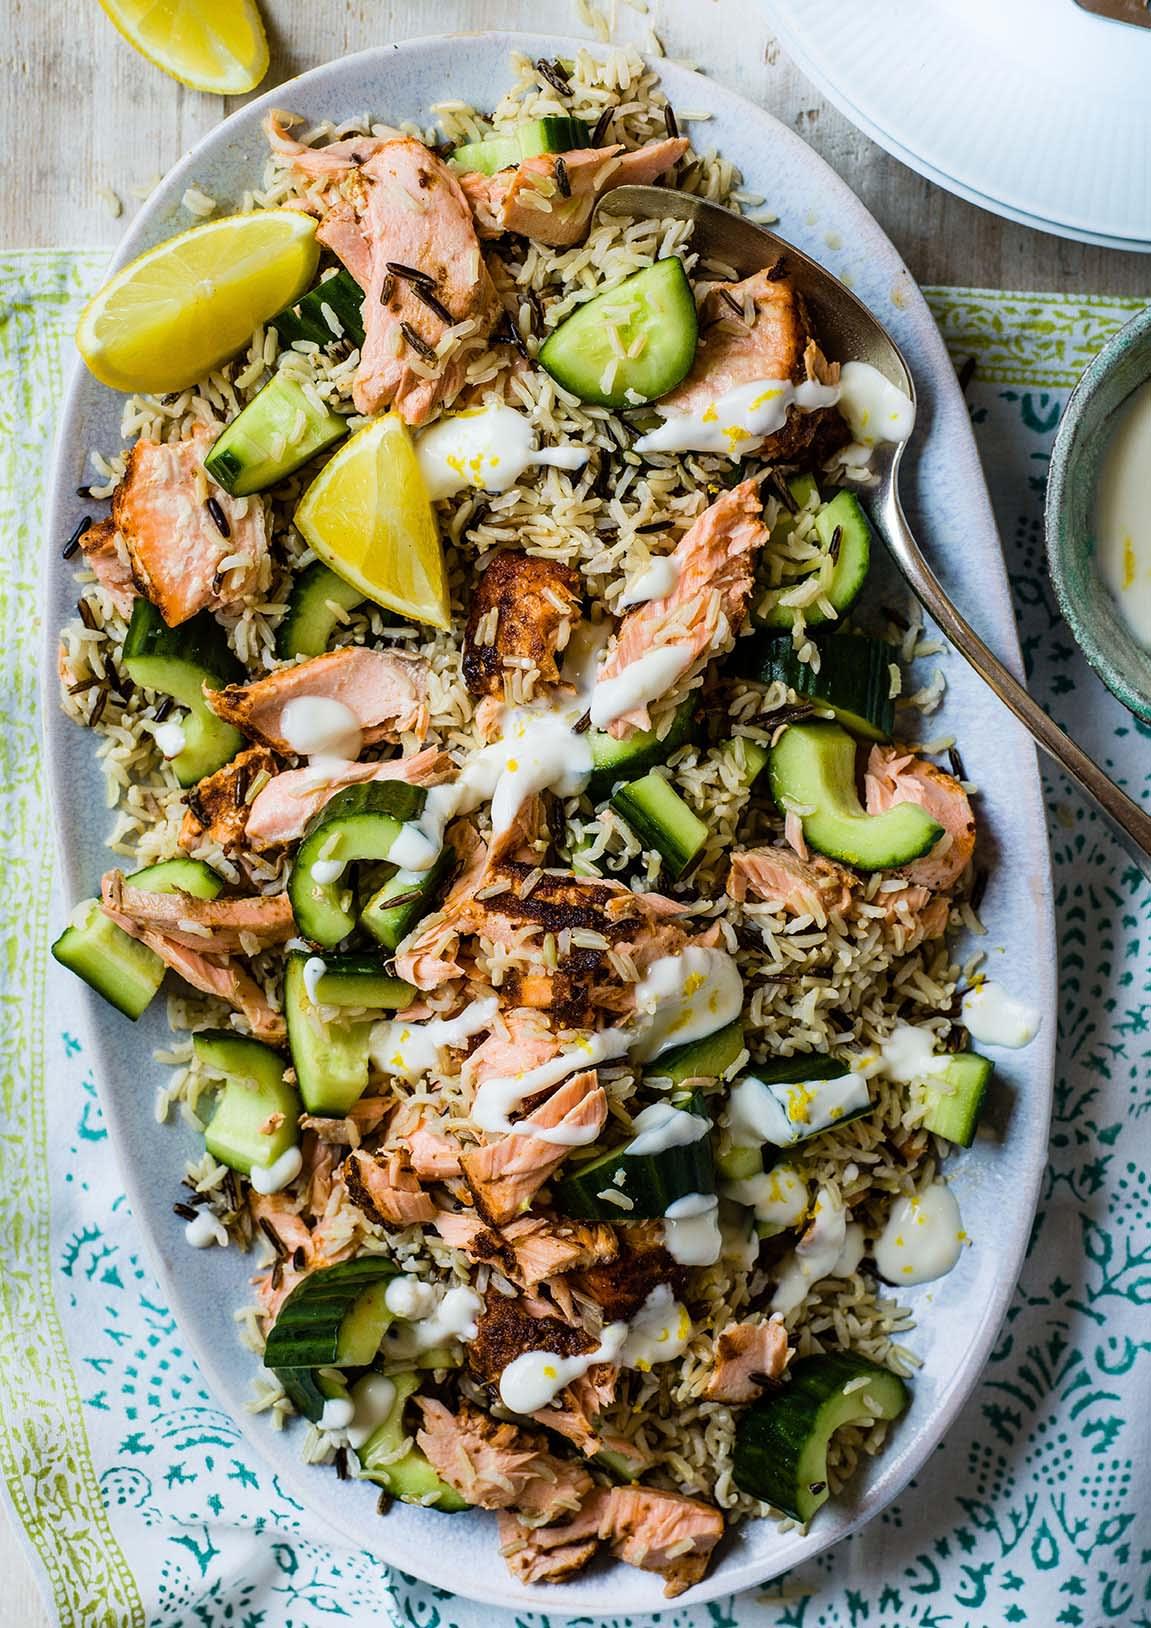 Photo of Spiced salmon & rice salad by WW